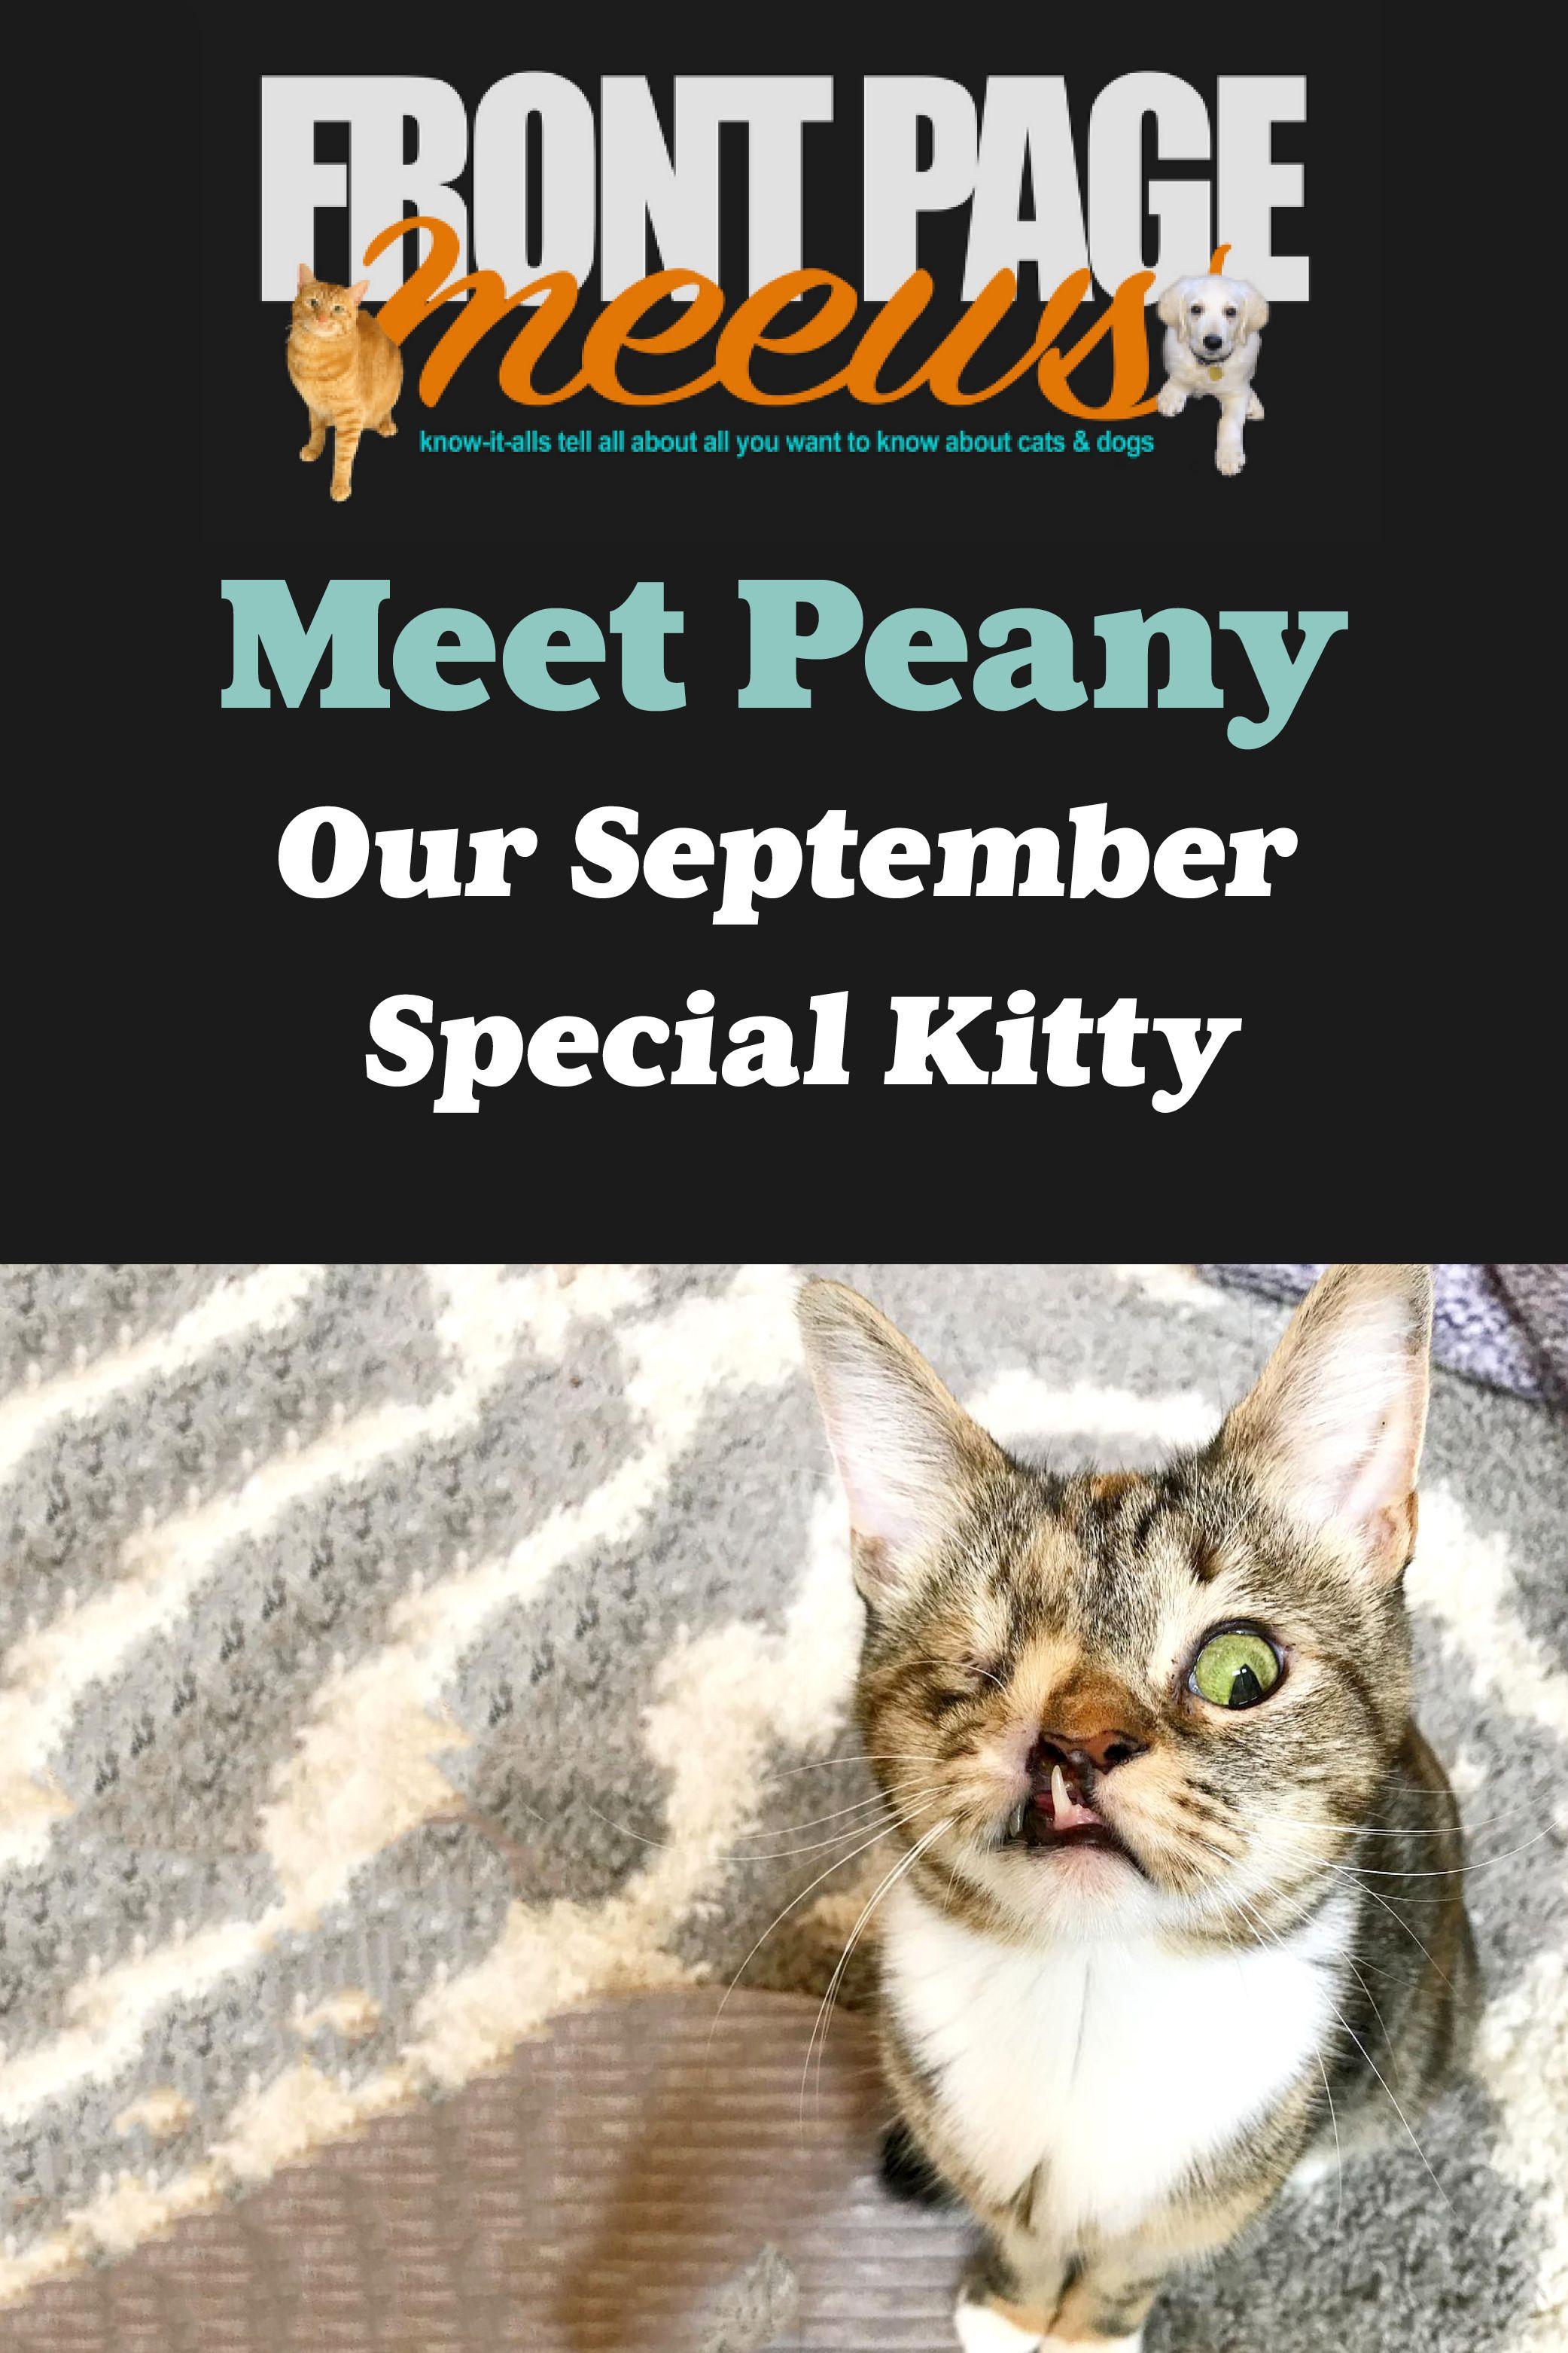 Meet Peany A Quirky Cutie Dog meet, Pet news, Quirky